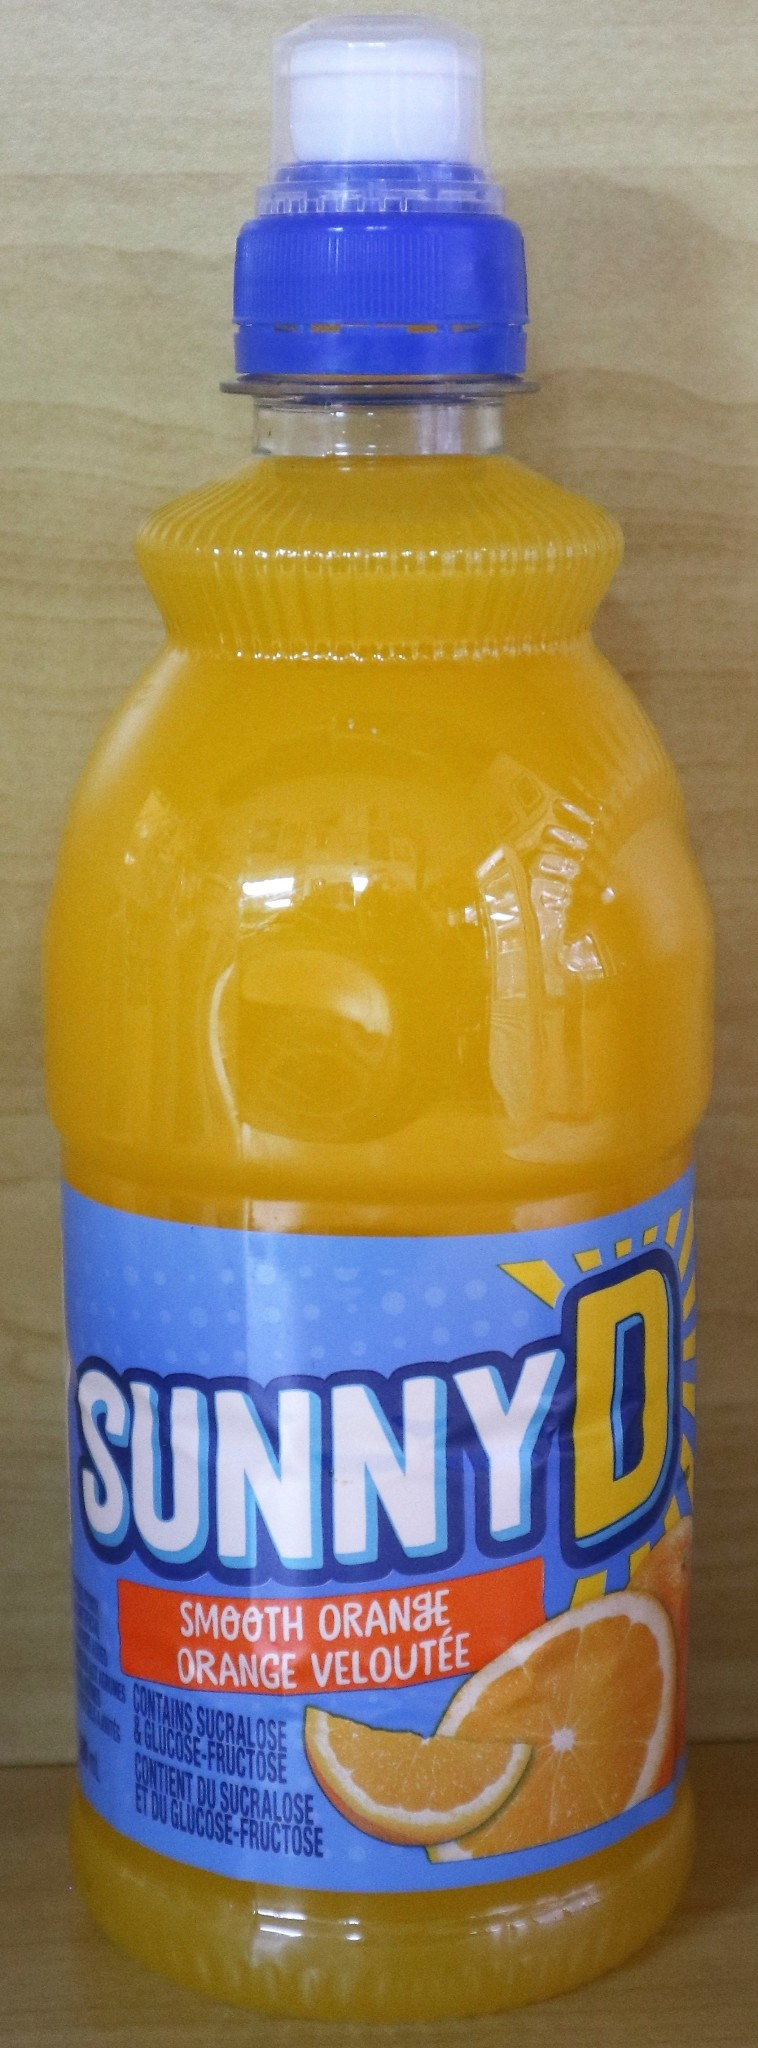 Sunny D - Smooth Orange - 500mL